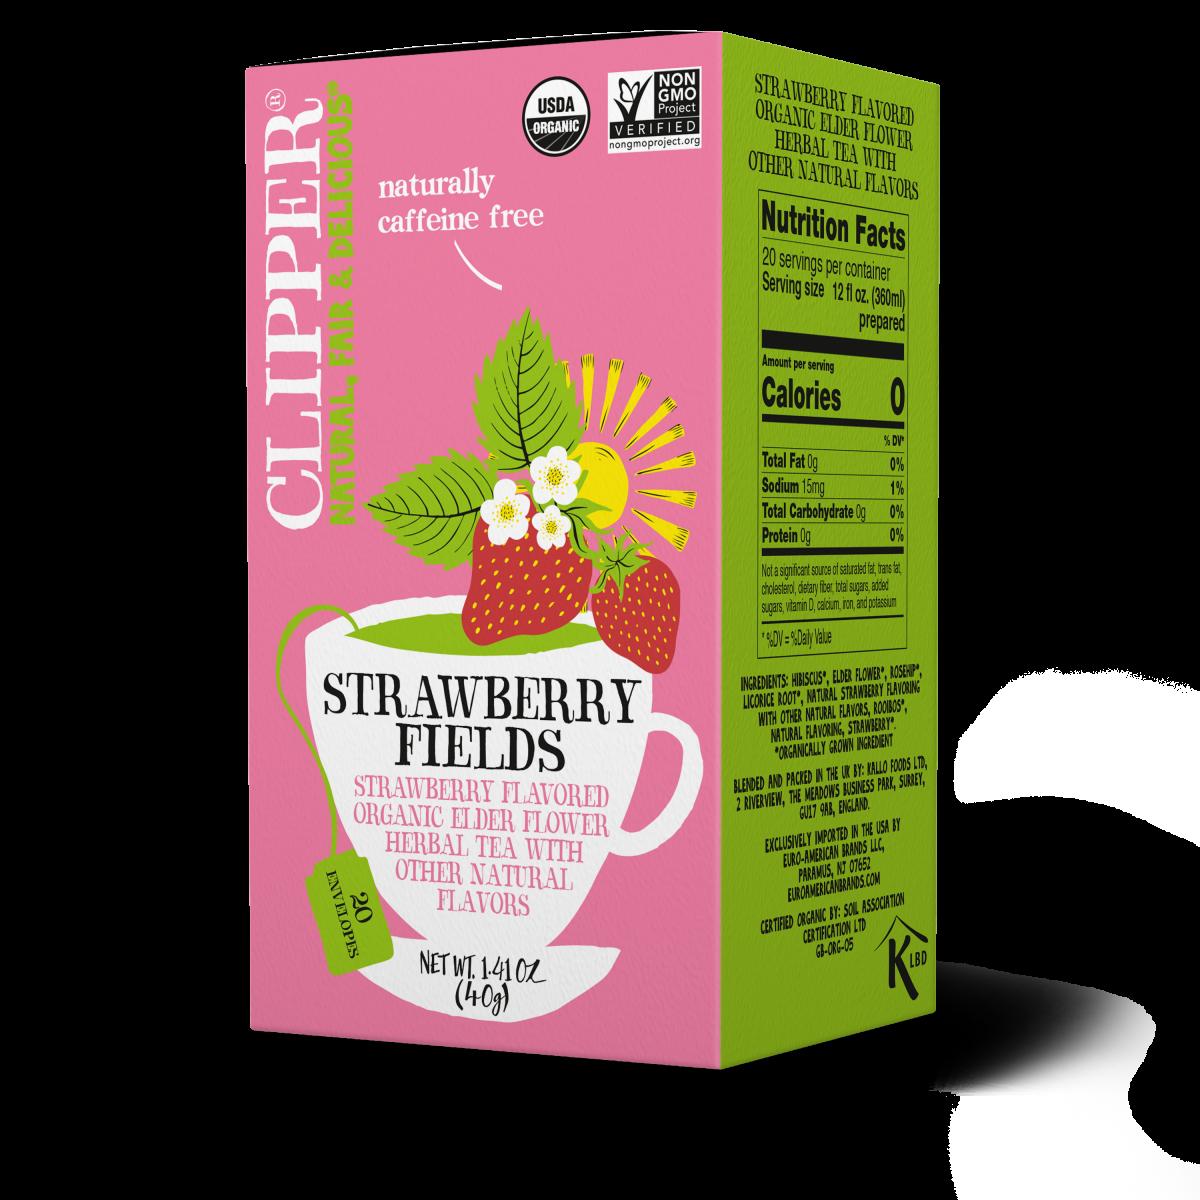 Strawberry Fields organic herbal infusion